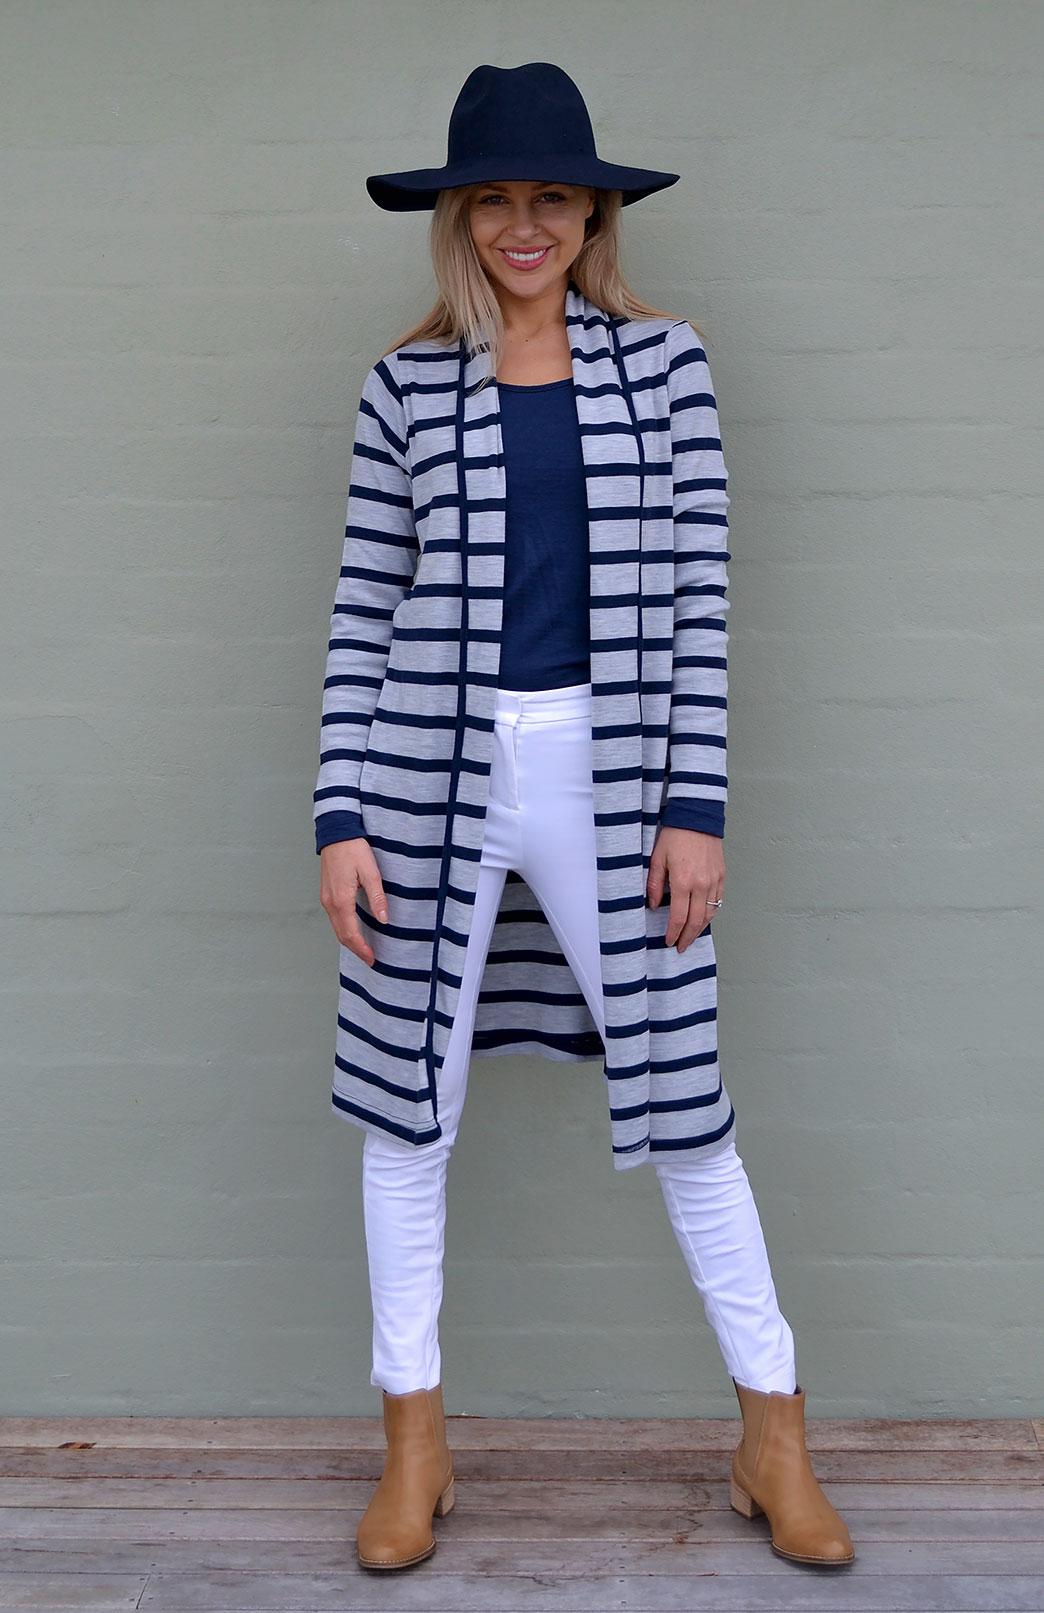 Long Drape Cardigan - Heavyweight - Women's Merino Wool Heavy Weight Striped Long Drape Cardigan - Smitten Merino Tasmania Australia